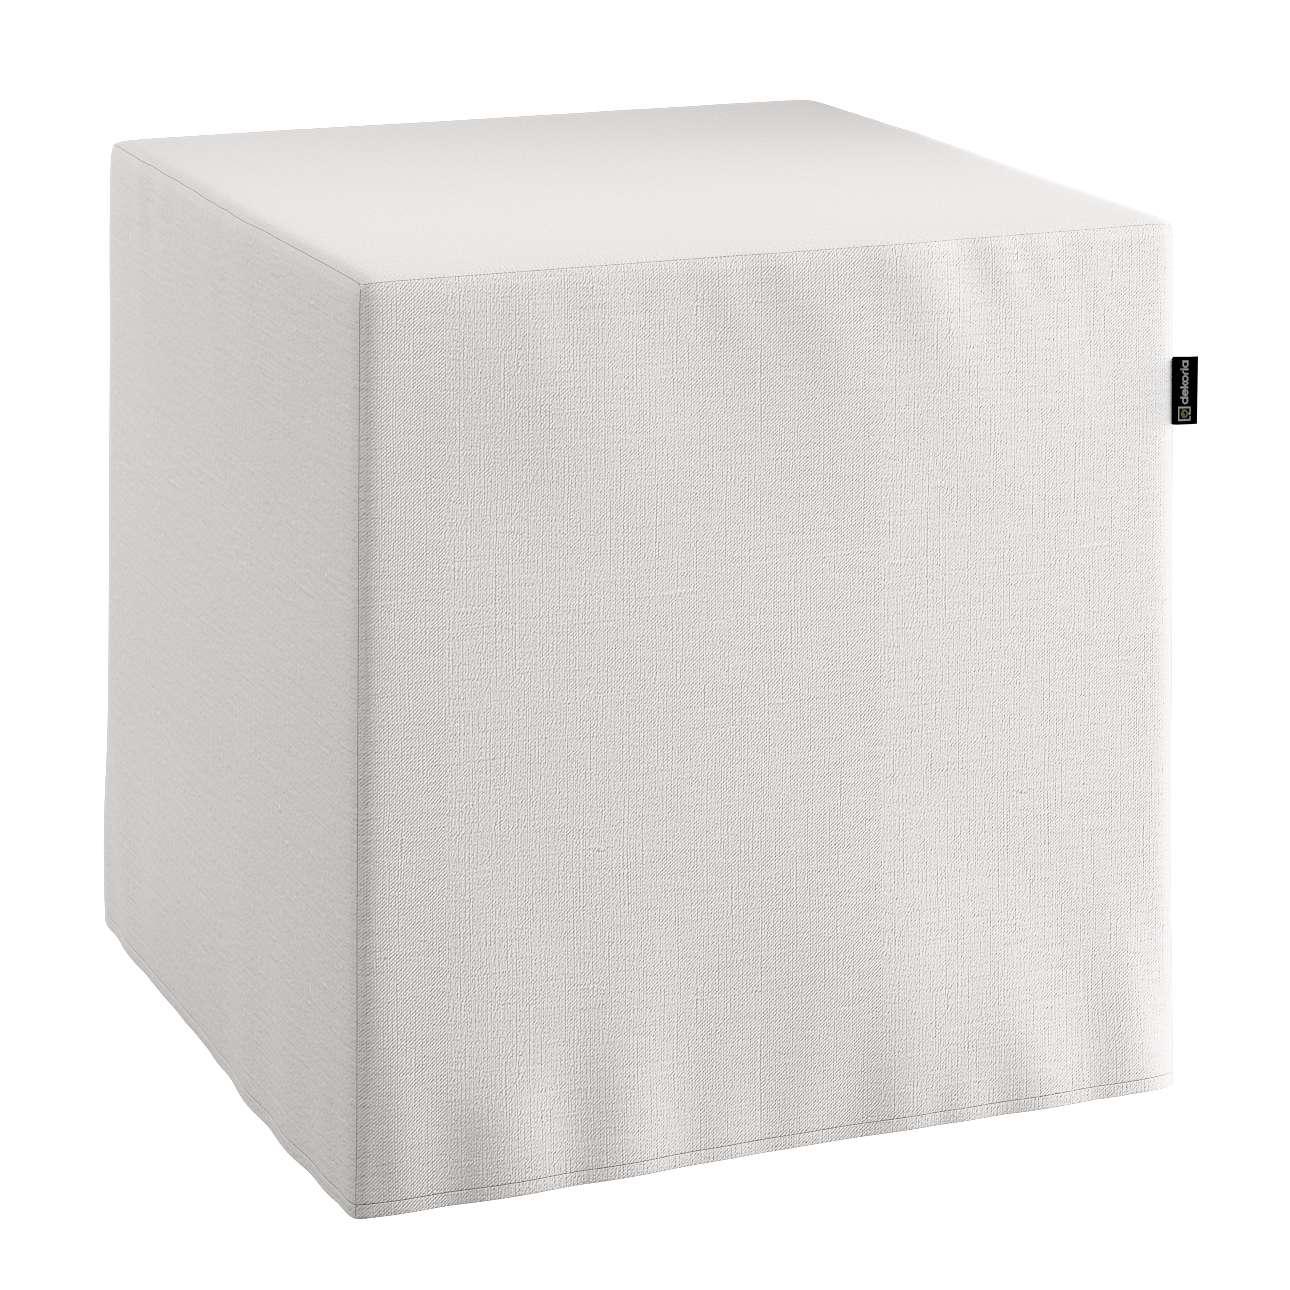 Pufo užvalkalas 40x40x40 cm kubas kolekcijoje Linen , audinys: 392-04